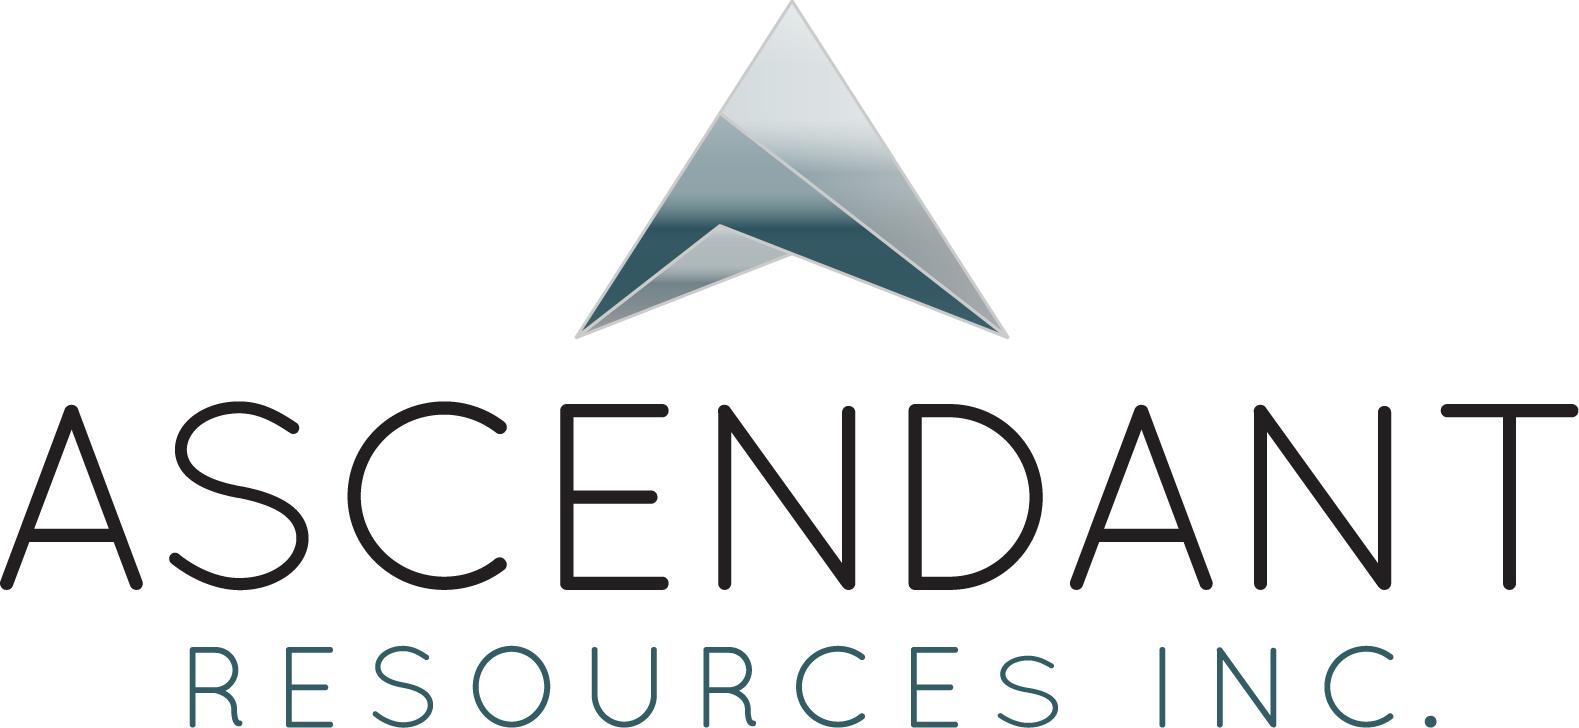 Ascendant Resources Completes Sale of El Mochito Mine